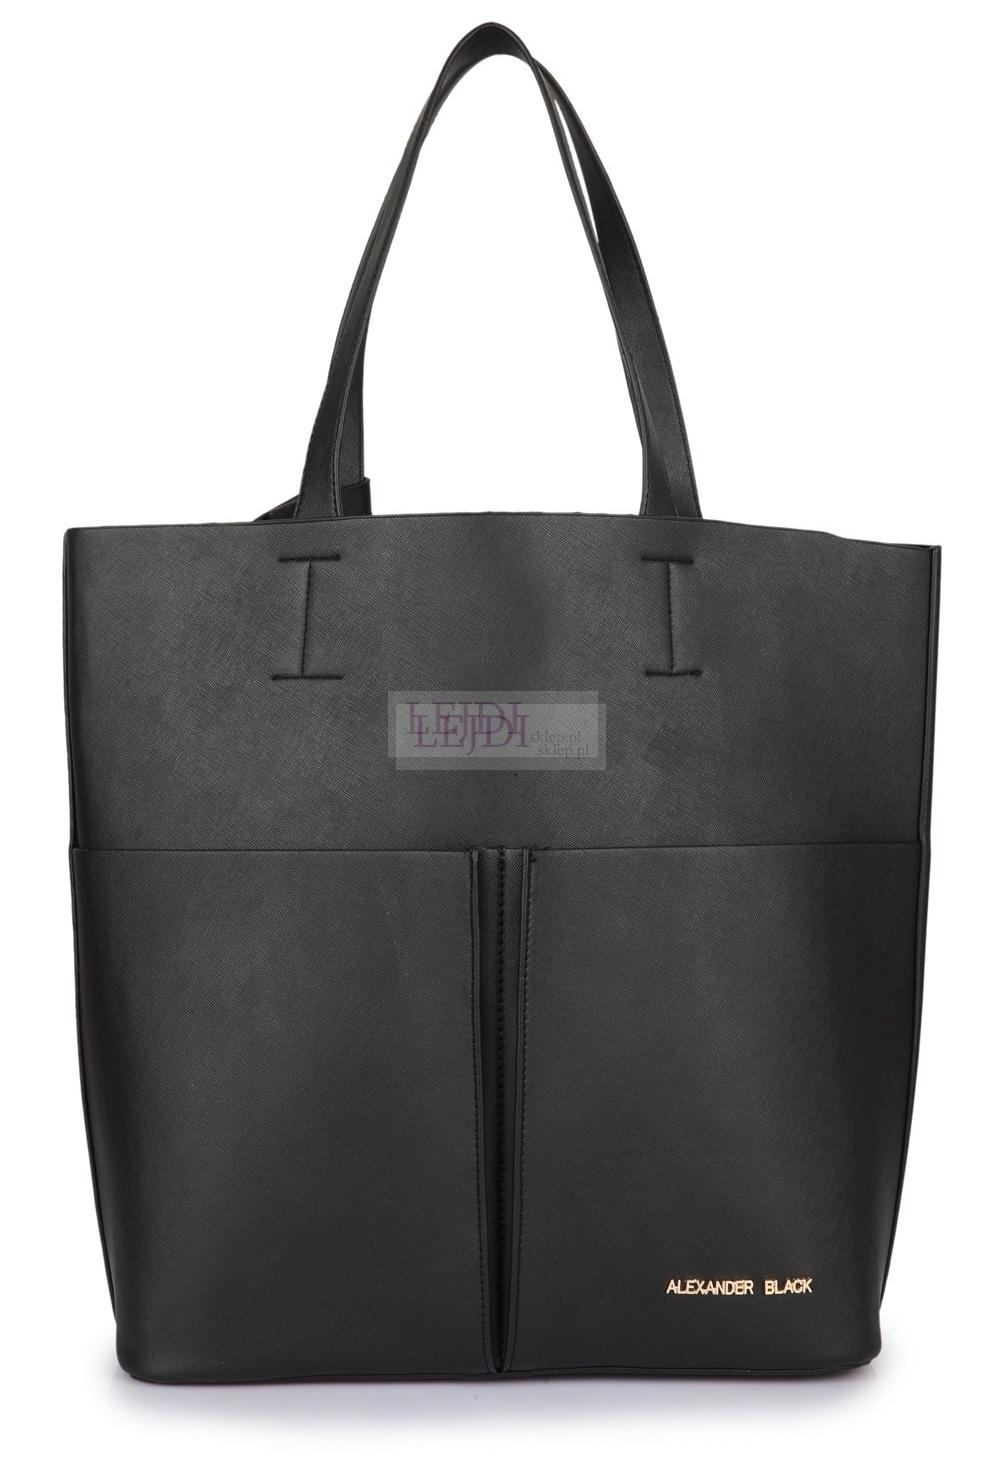 Duża torebka typu shopper